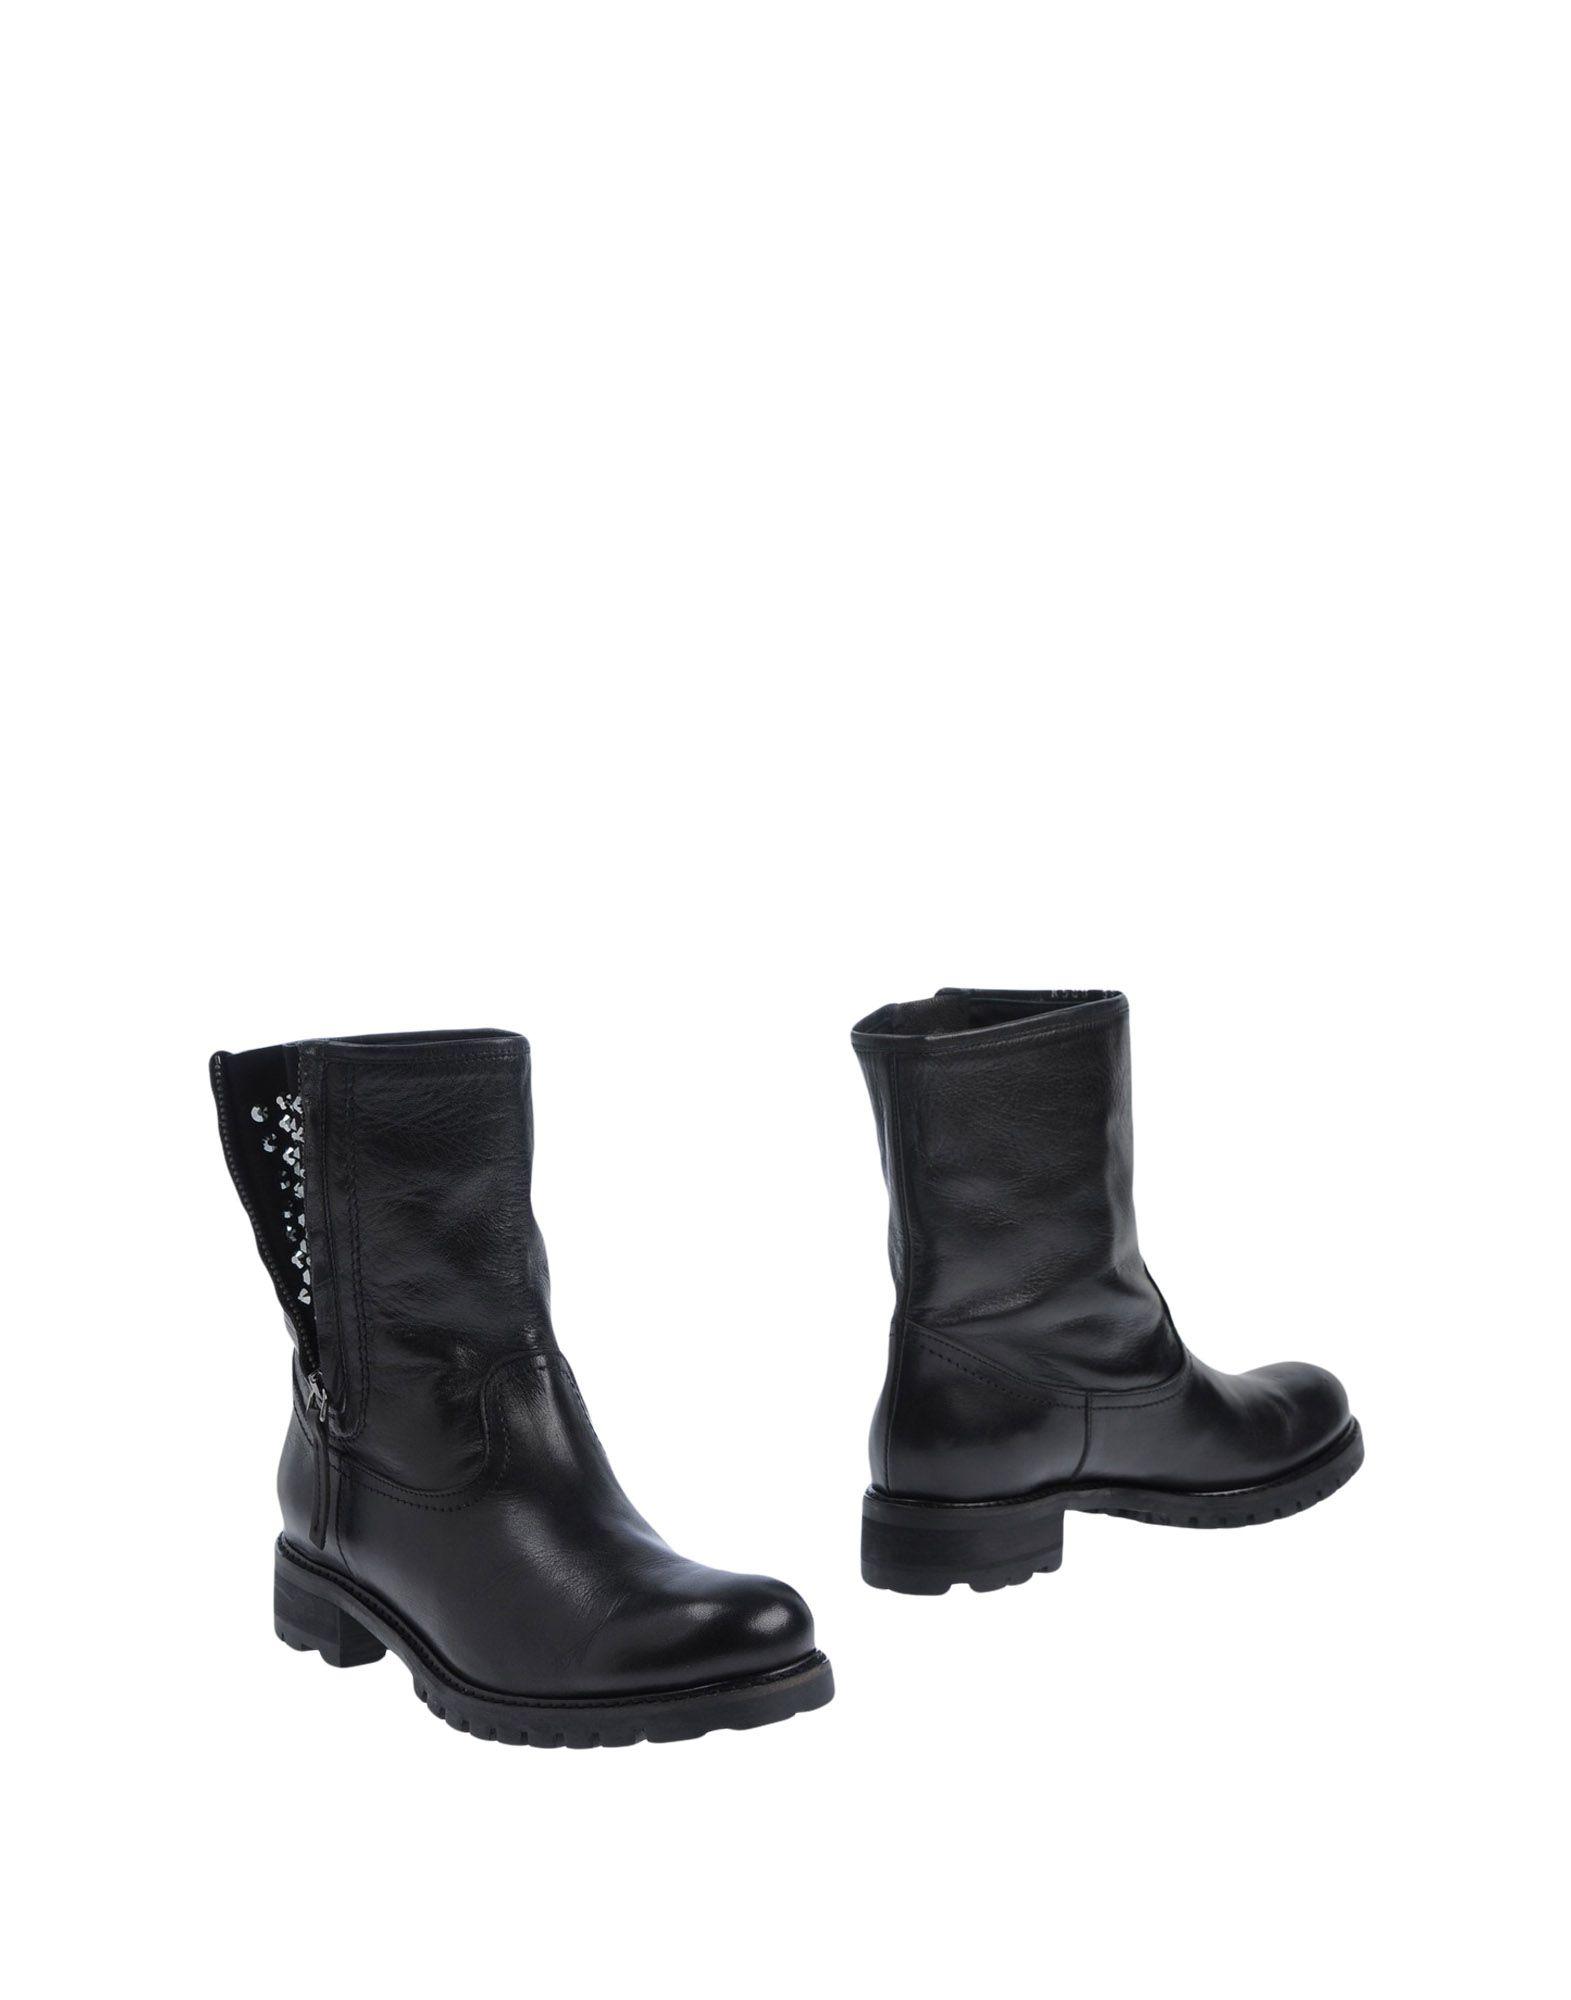 Stilvolle Sensunique billige Schuhe Sensunique Stilvolle Stiefelette Damen  11508439HB 18ad21